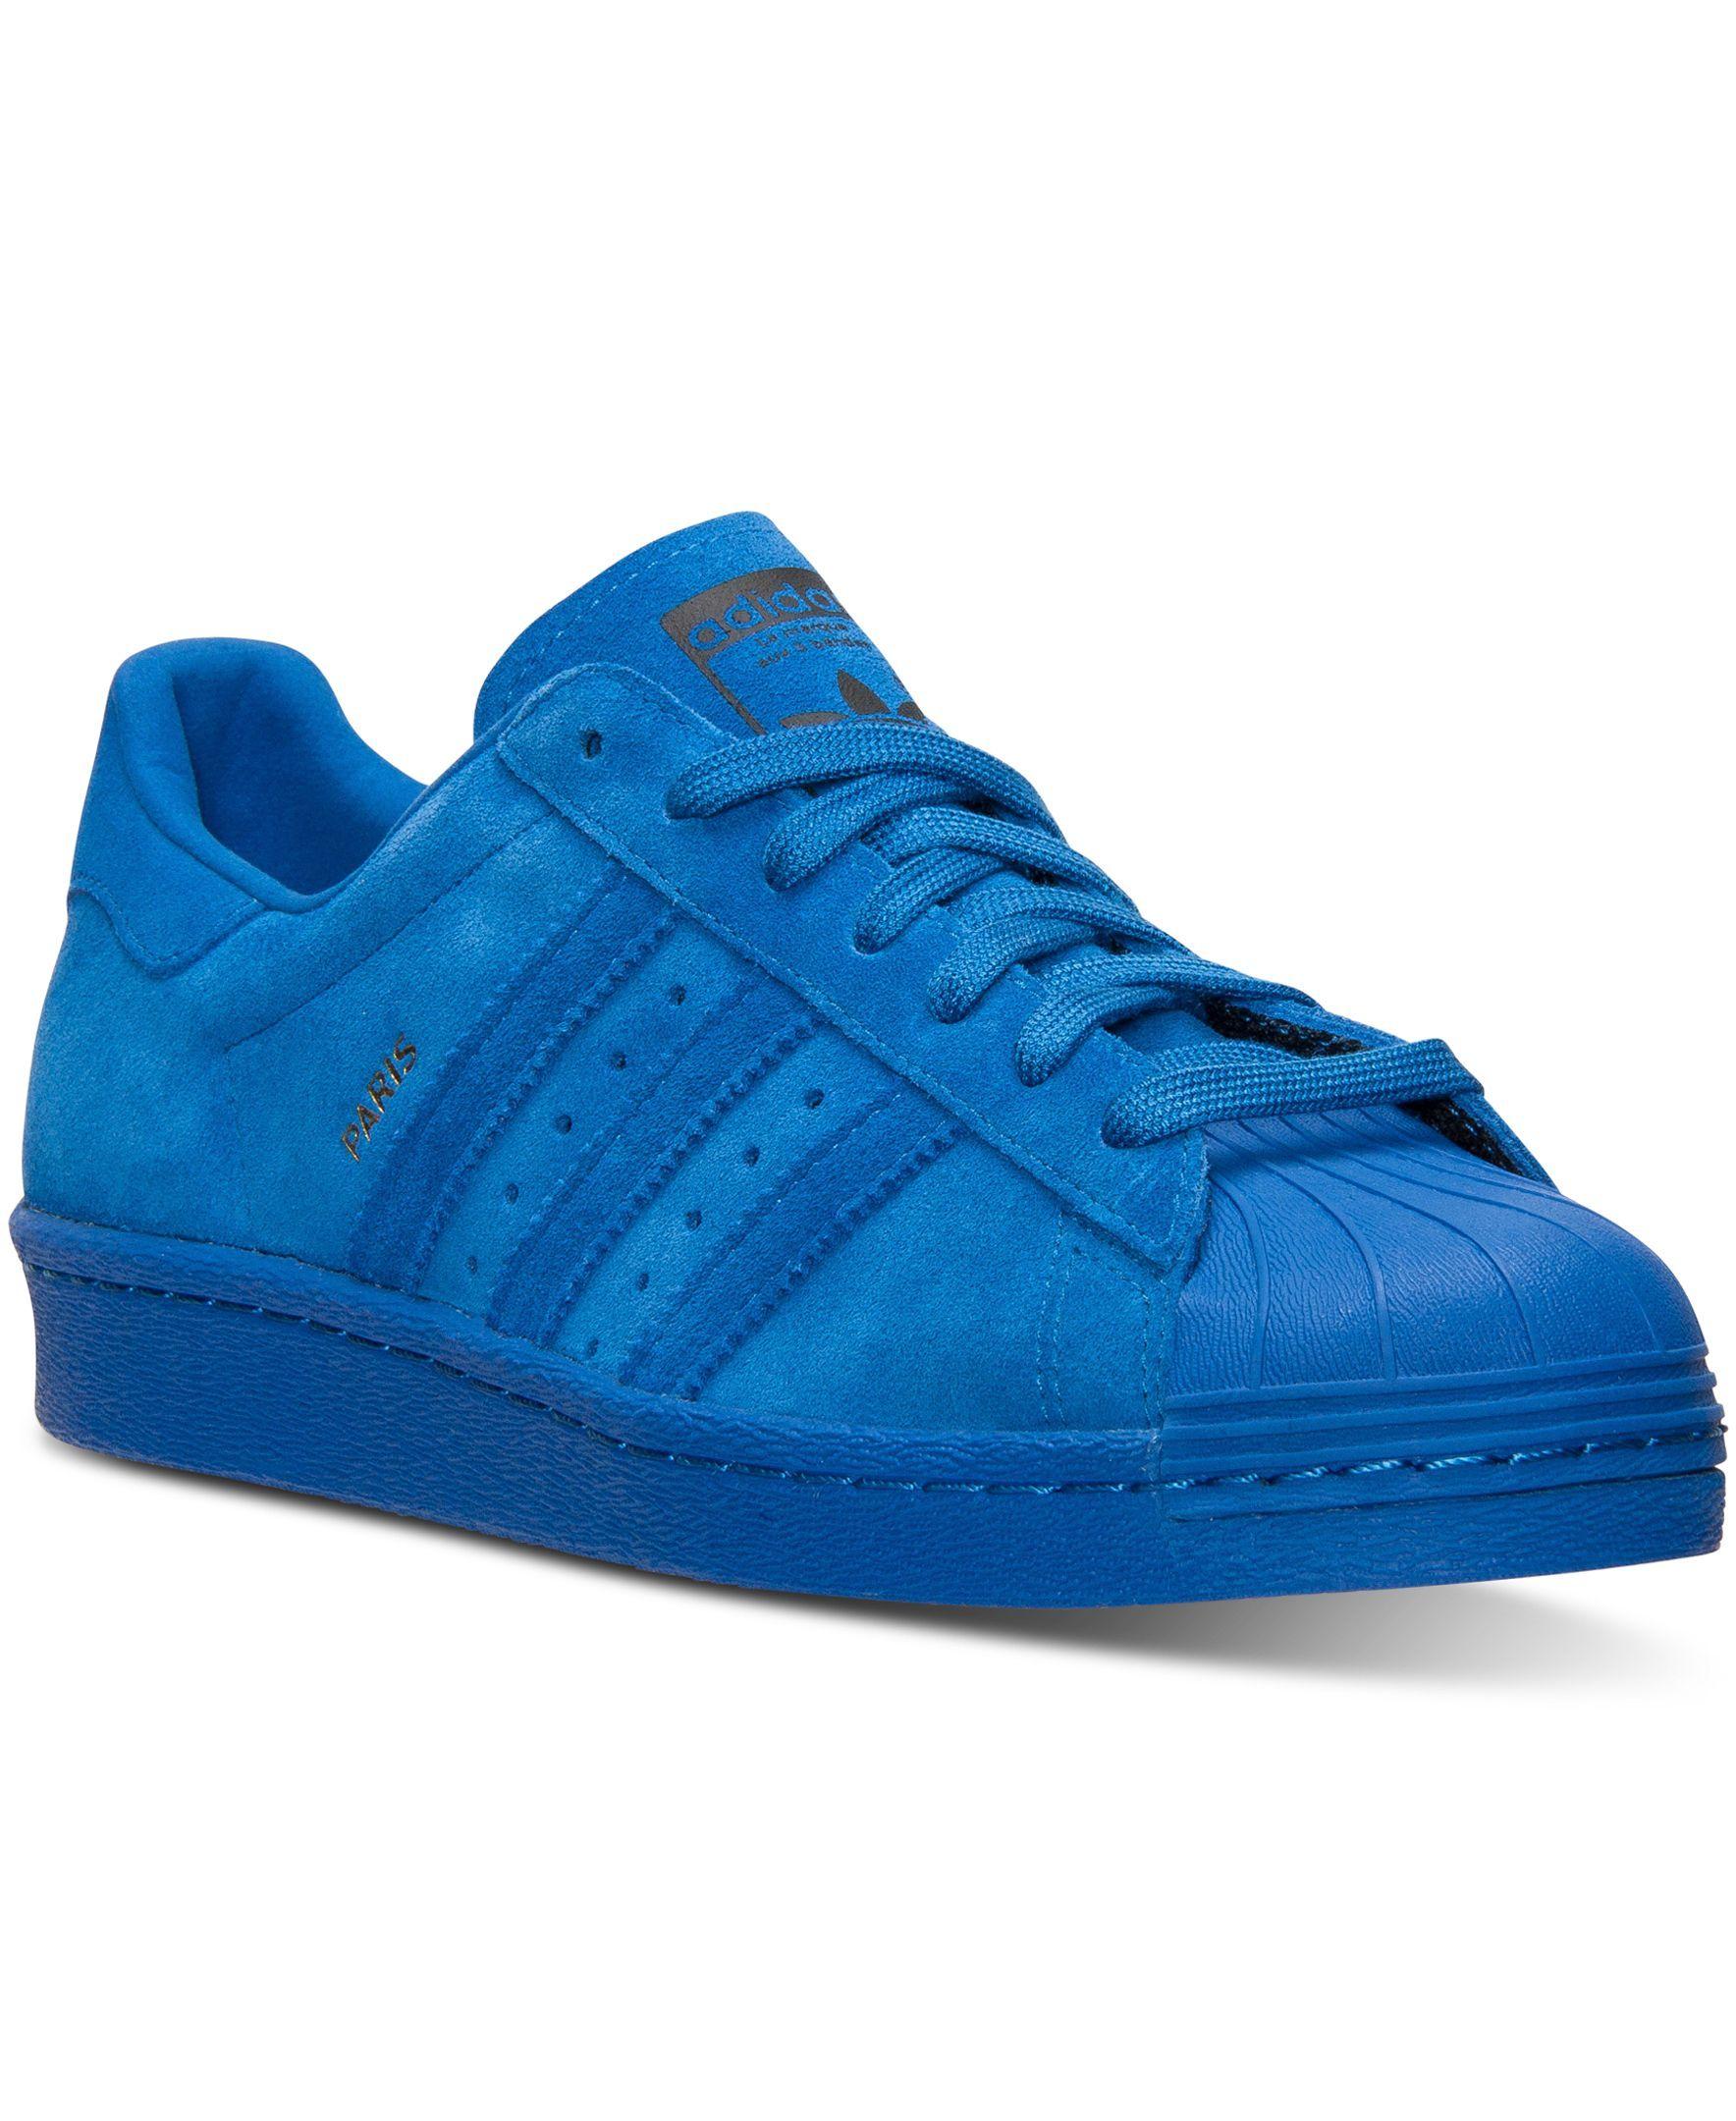 Adidas Superstar Casual Degli Uomini Città Parigi Casual Superstar Scarpe Dal Traguardo 0b69d8